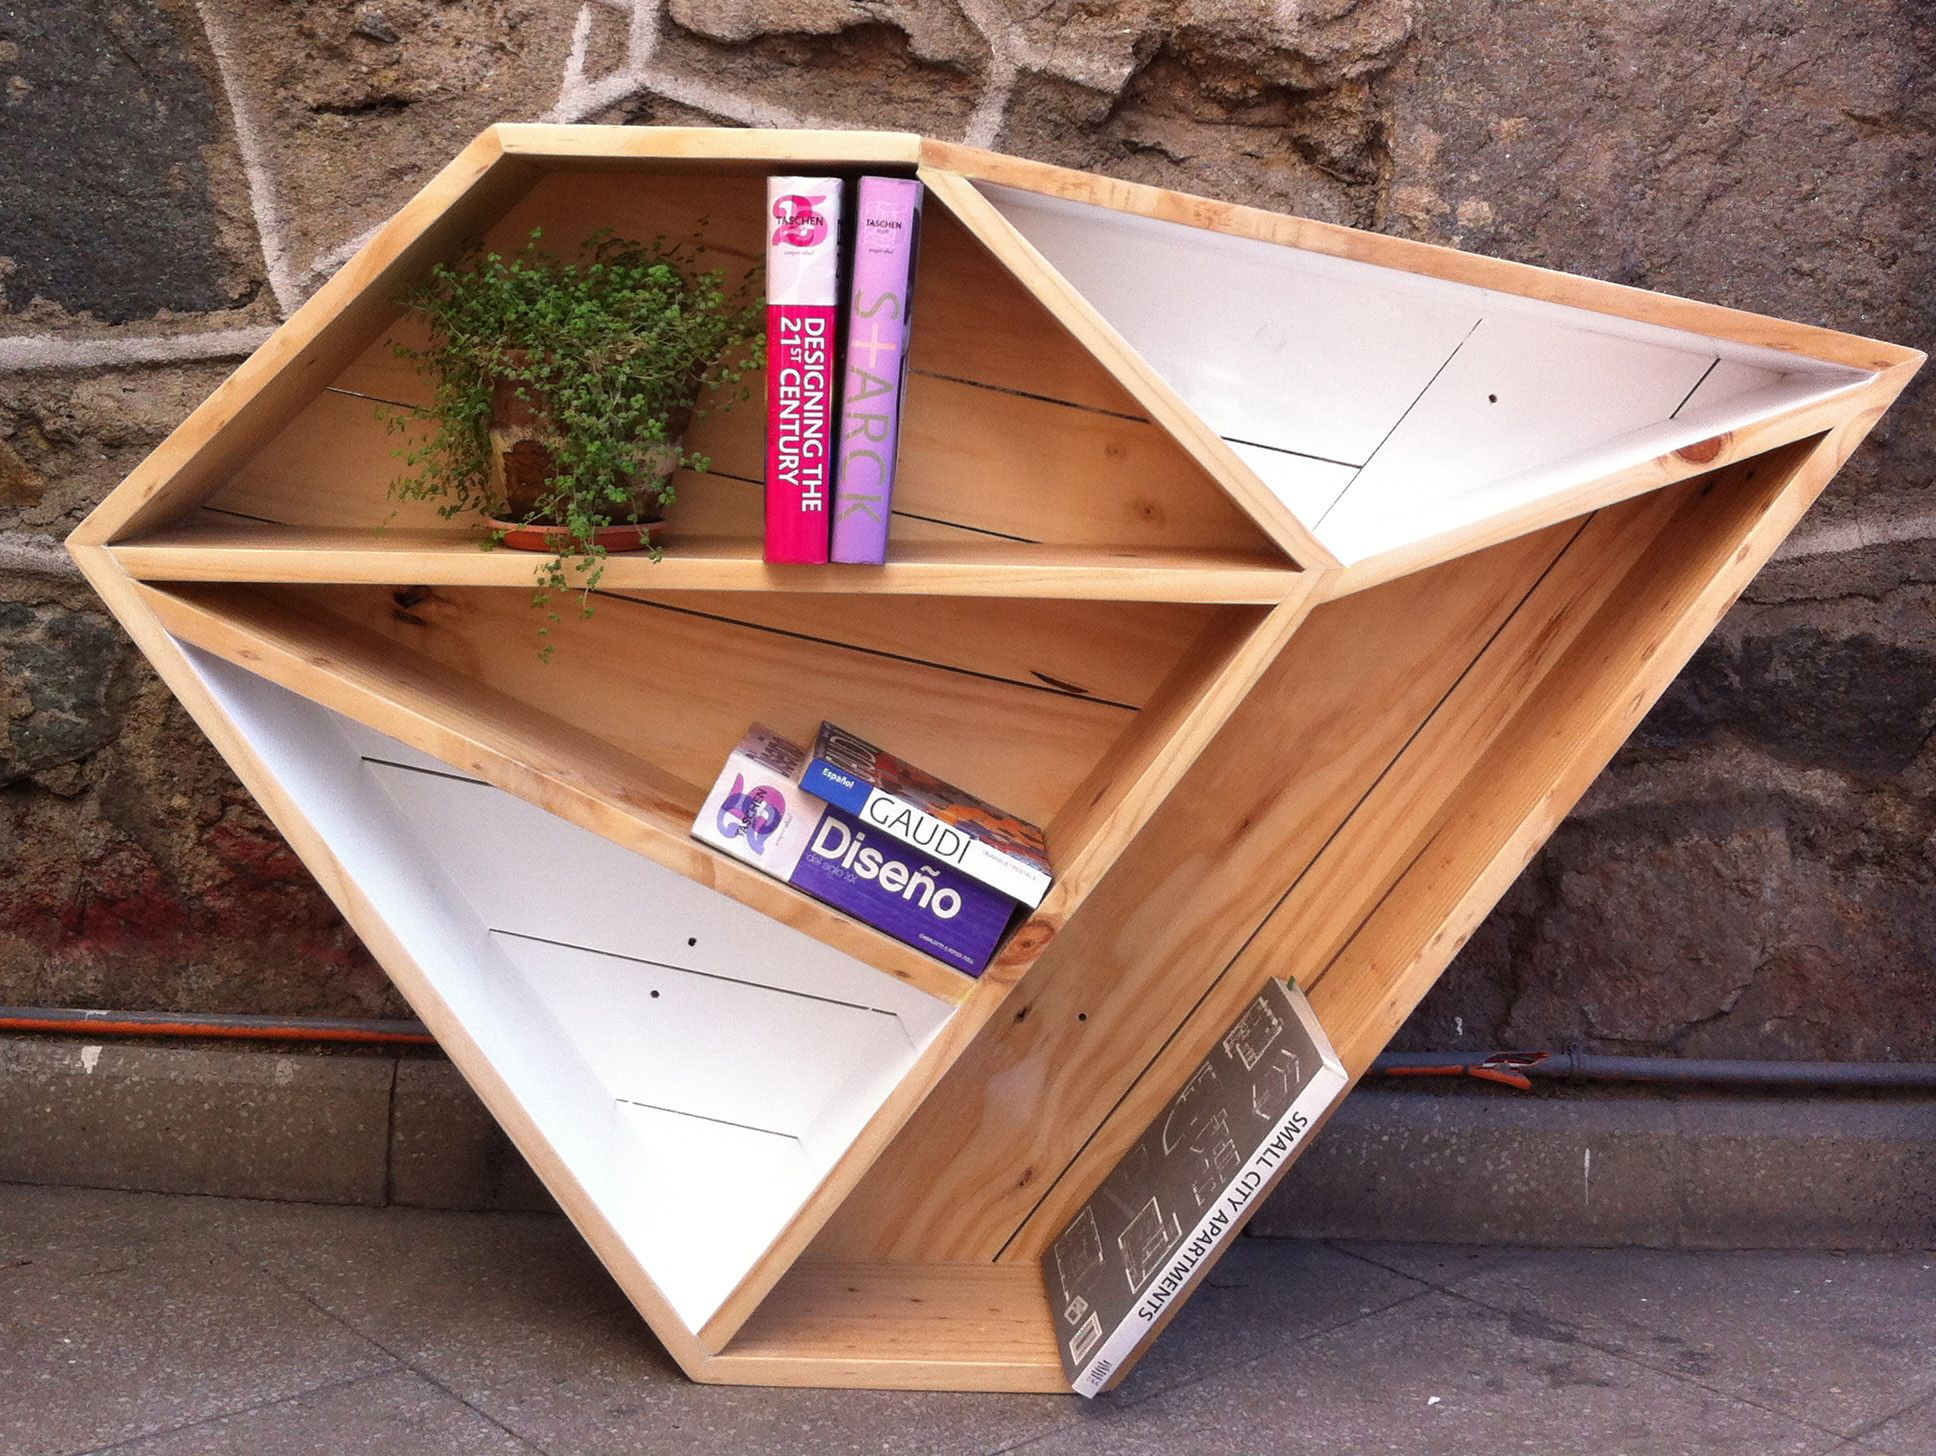 Mueble Con Figuras Geometricas Objetos Muebles Pinterest  # Muebles Geometricos